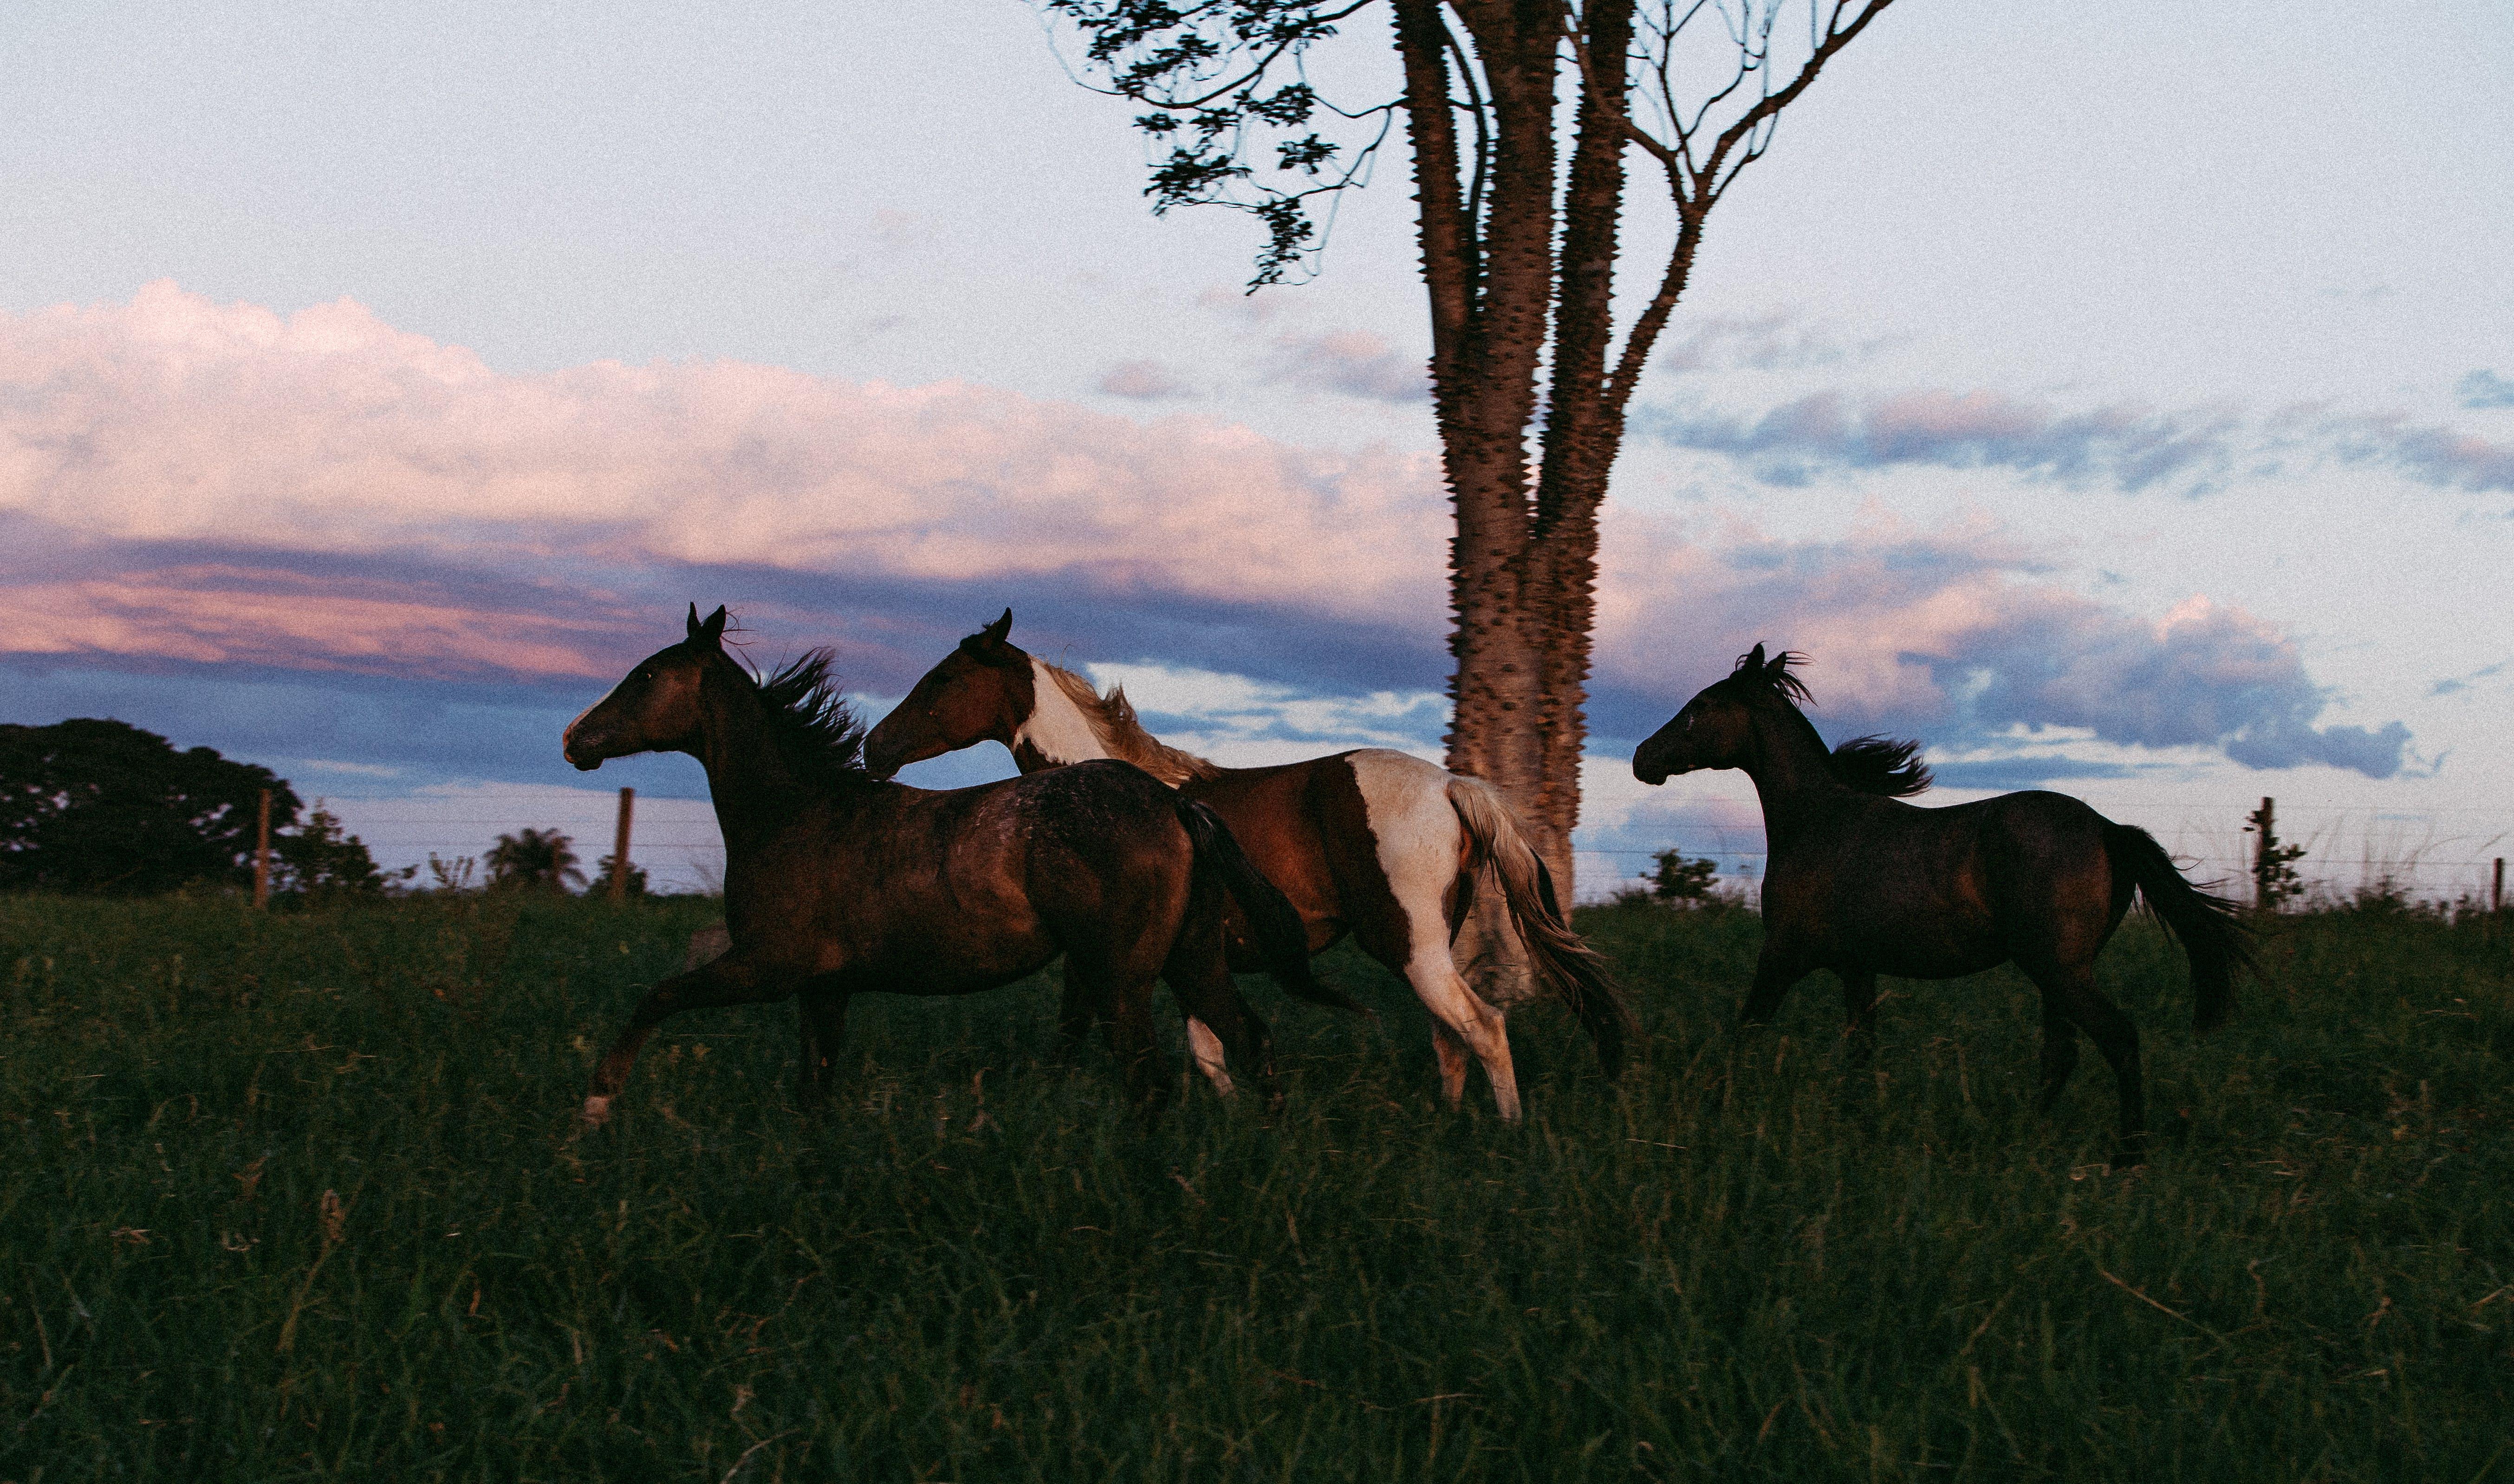 Photo of Three Horses Running on Grass Field